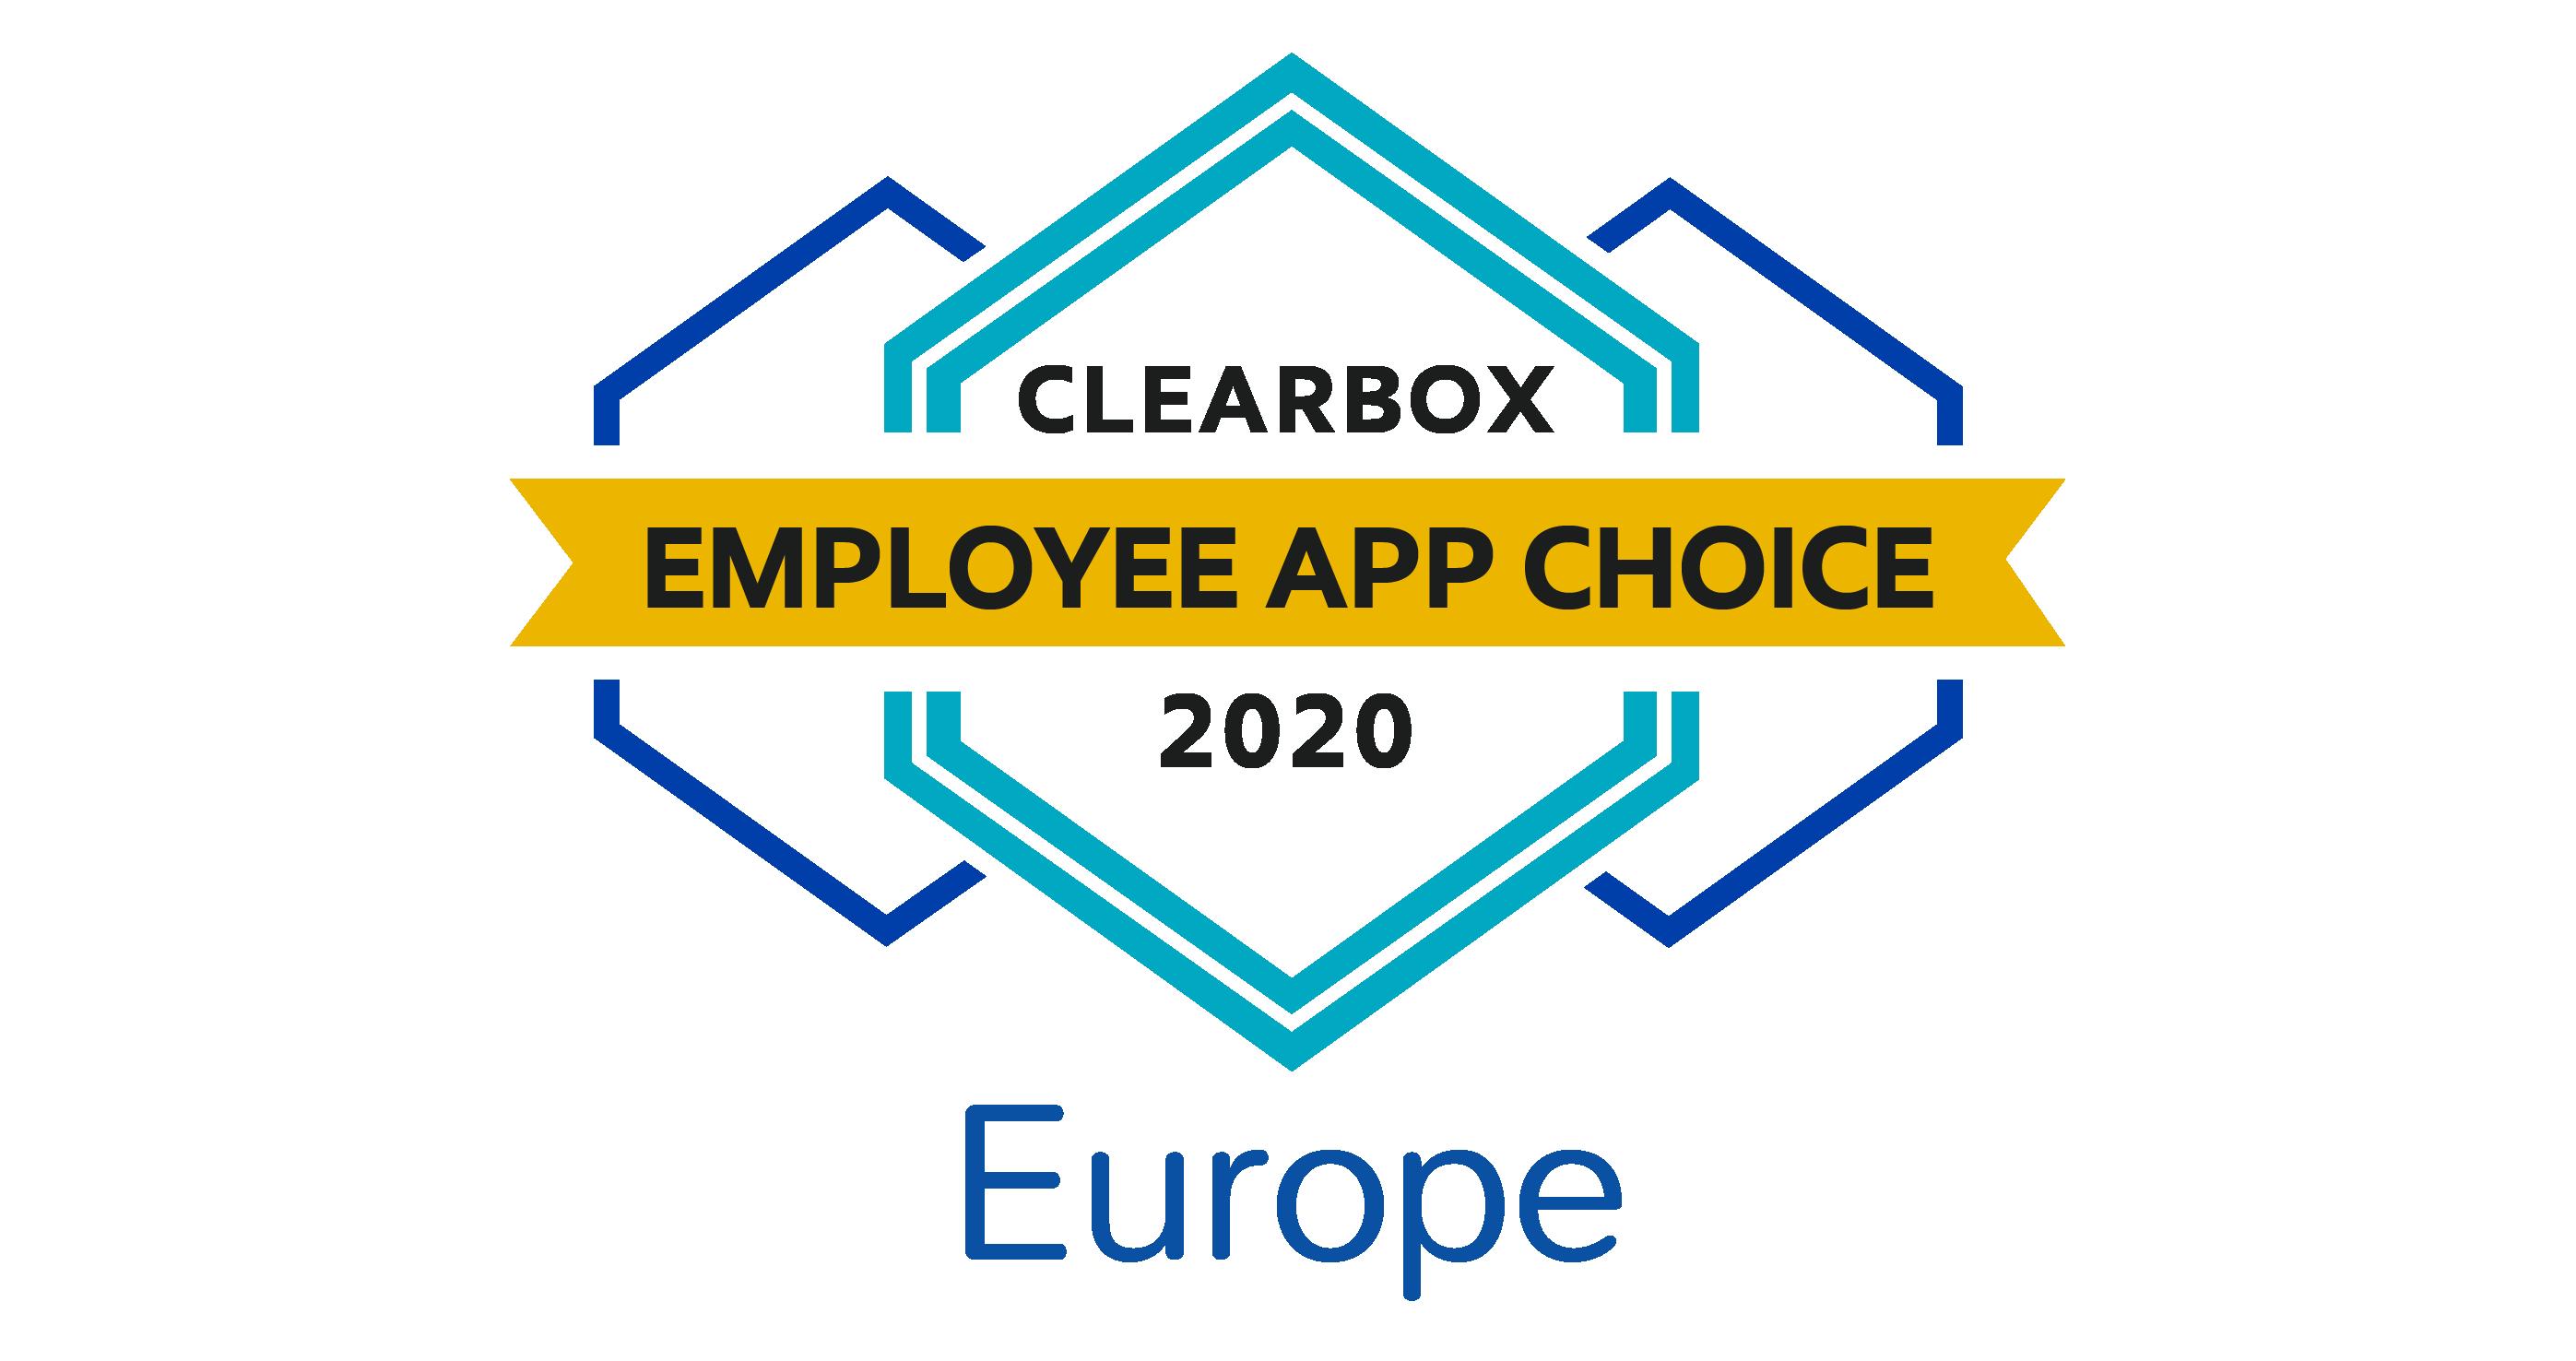 Employee app choice Europe 2020.